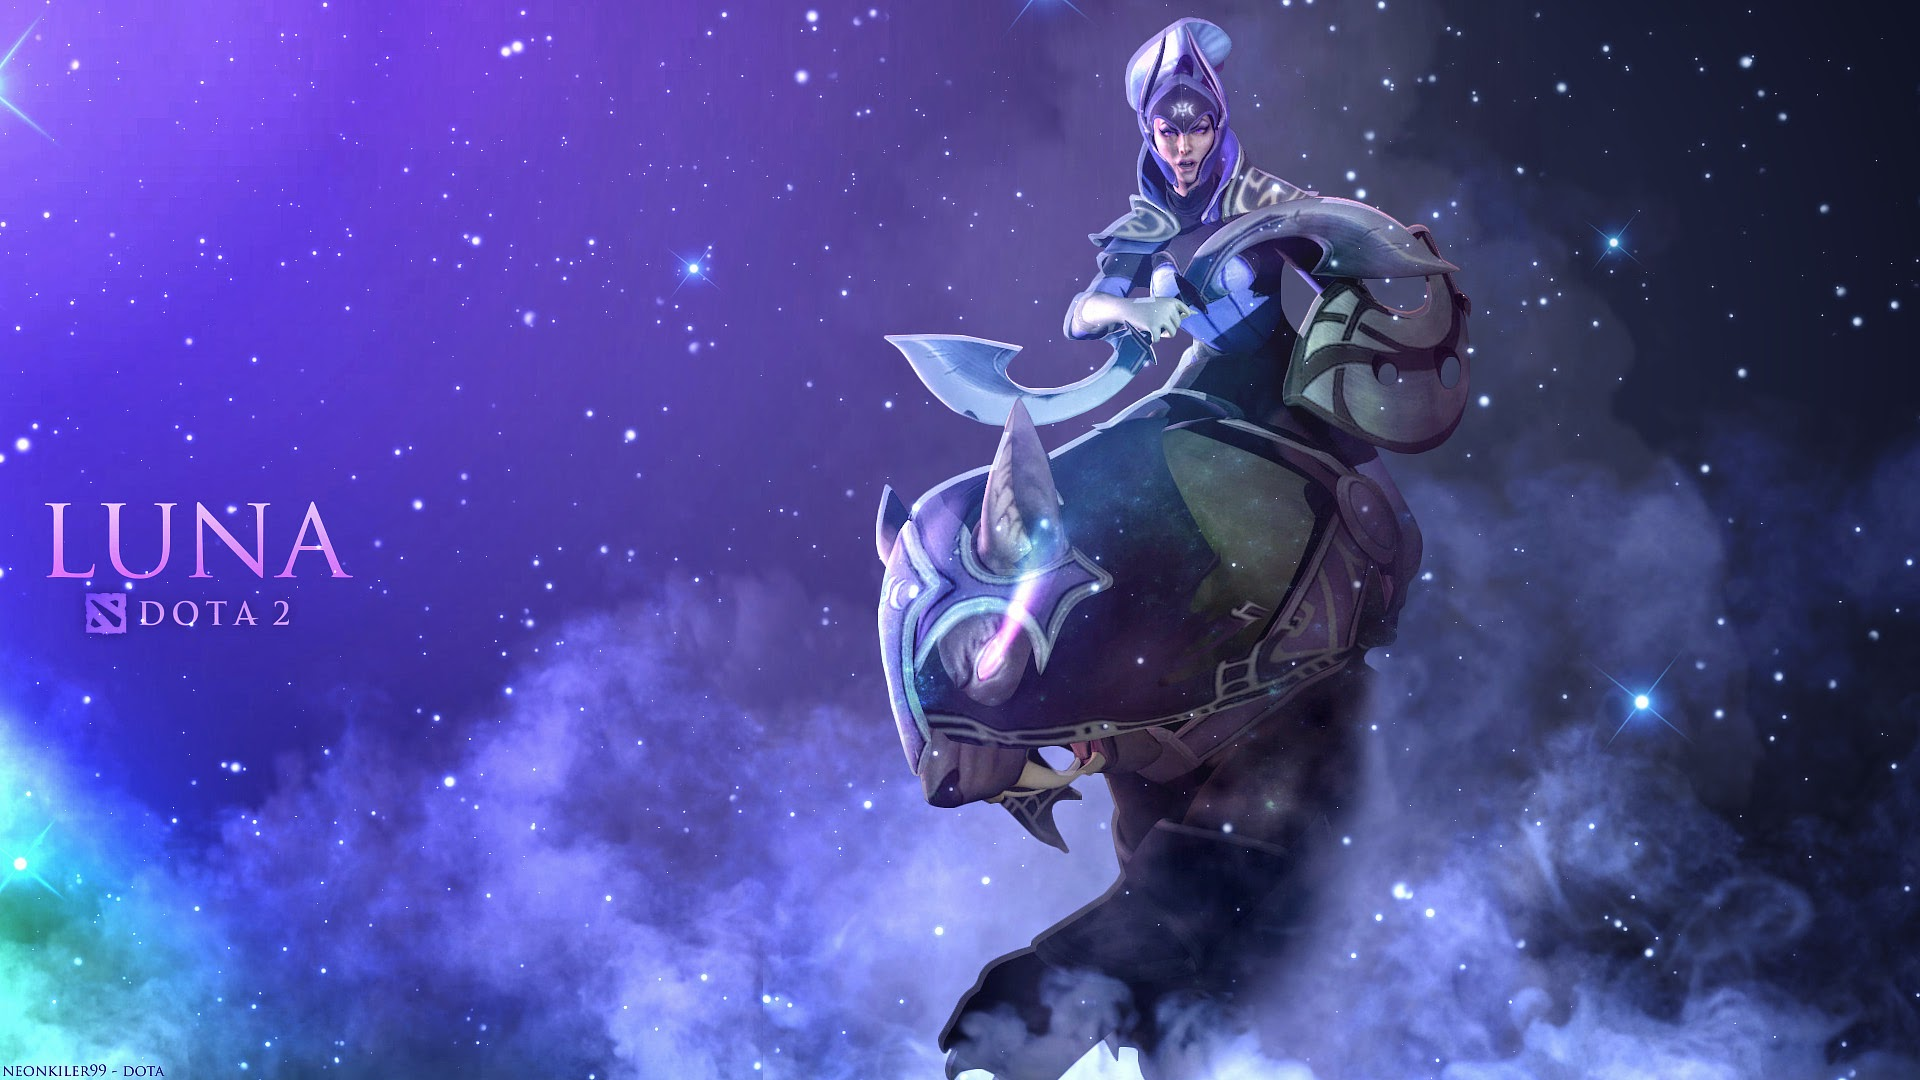 luna moon rider dota 2 hero hd wallpaper deviant art 1920x1080 a388 1920x1080